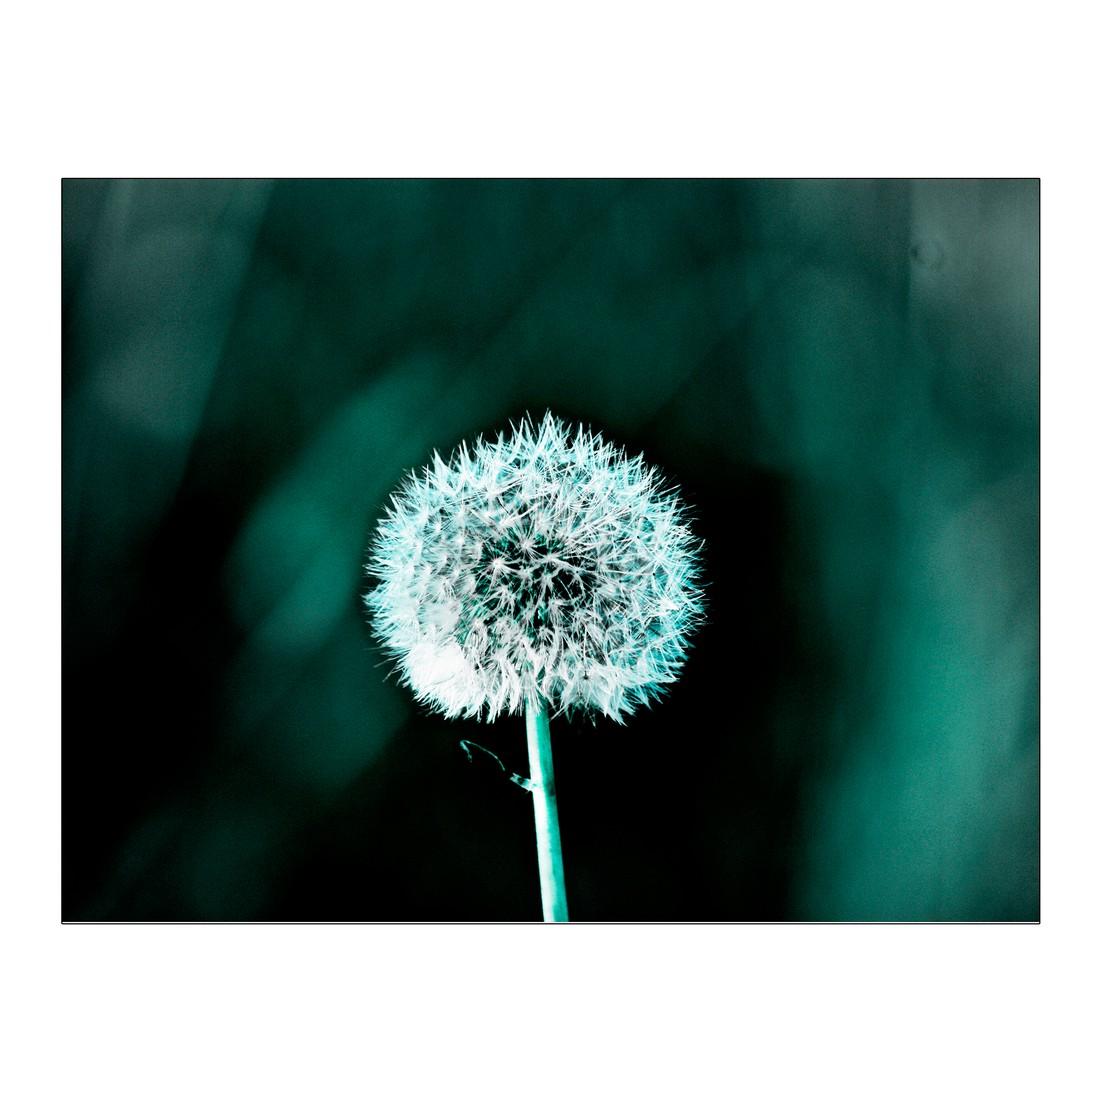 Leinwandbild Pusteblume – 100×75 cm, Gallery of Innovative Art günstig